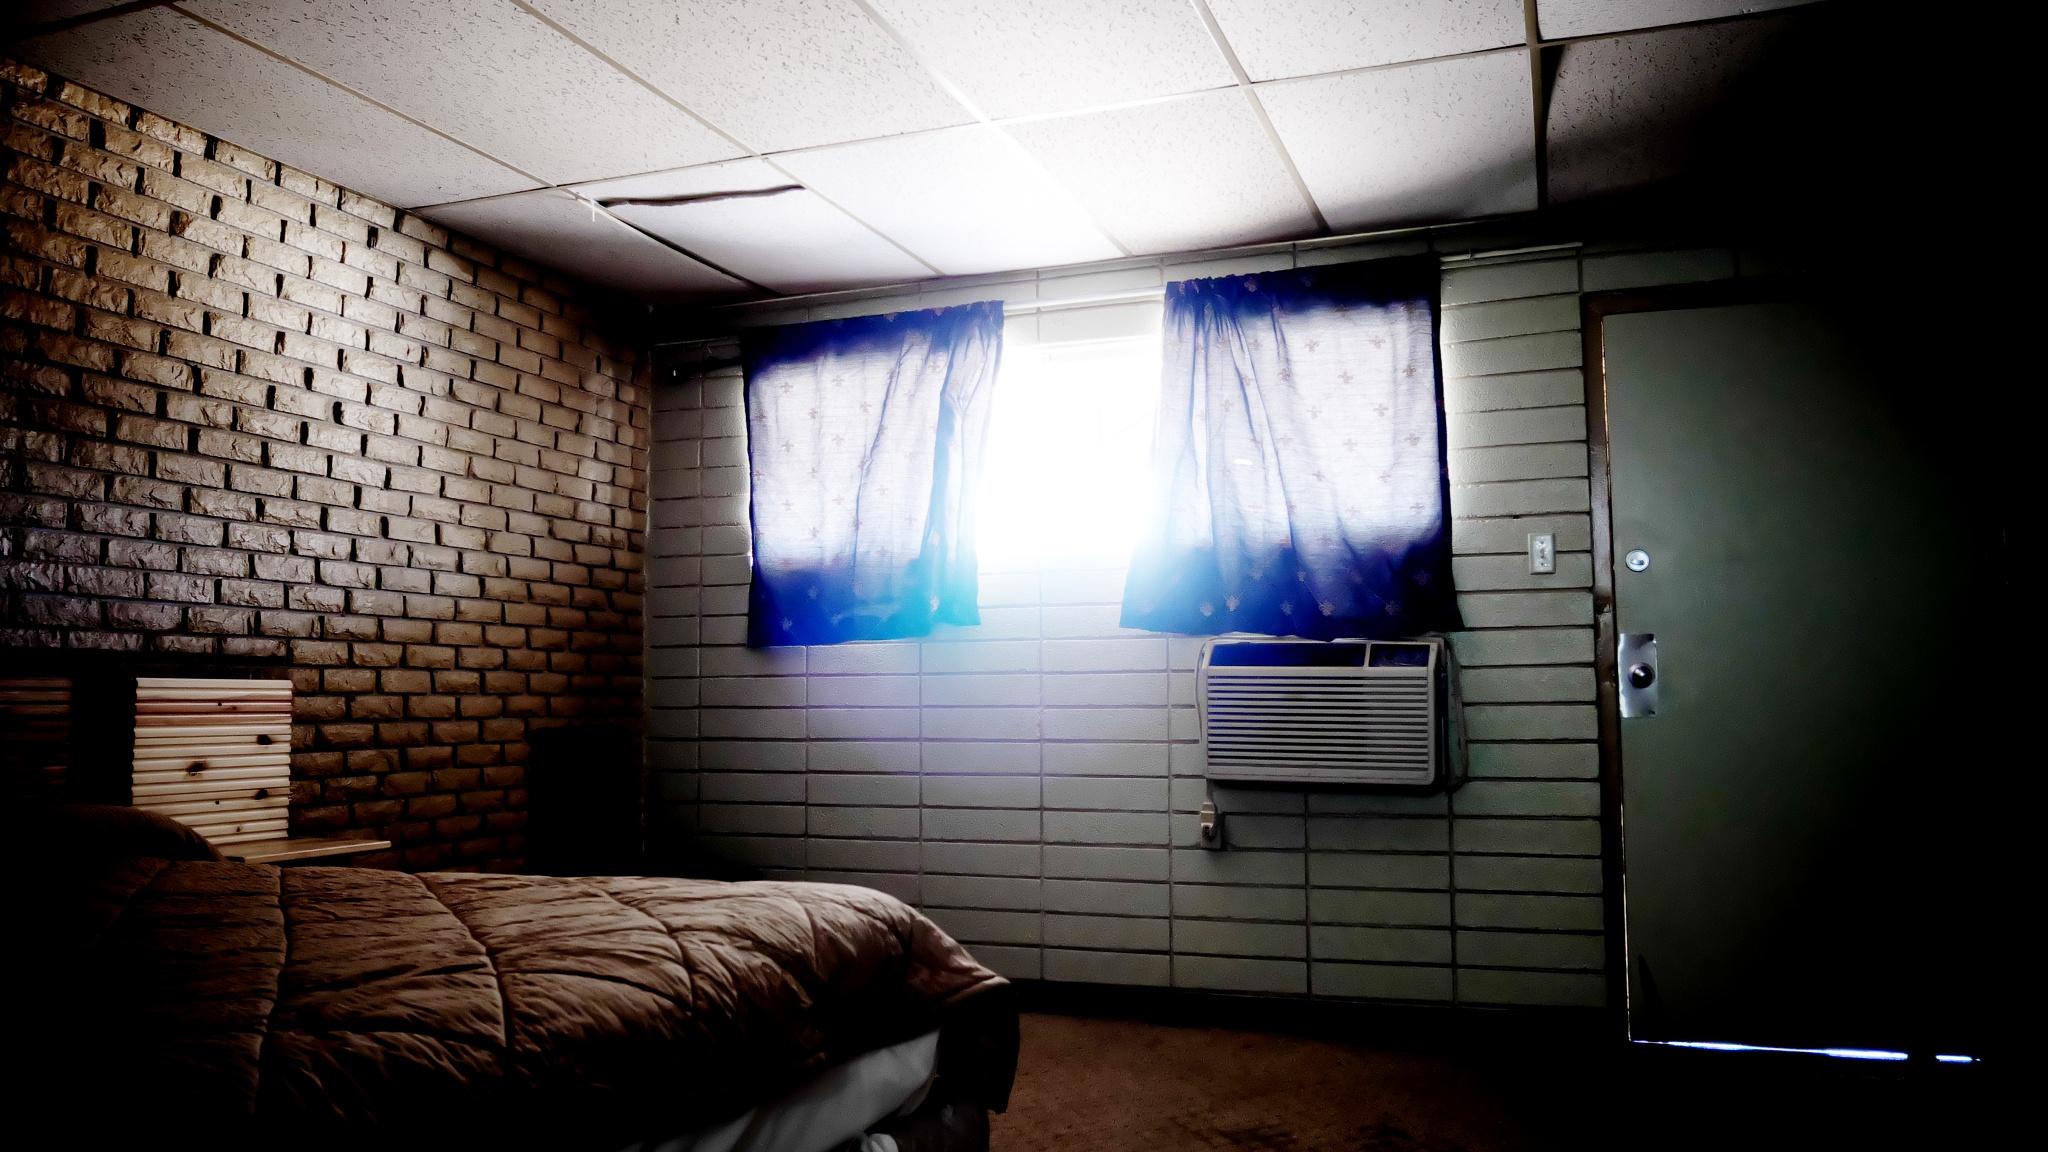 motel's room by florianforleo